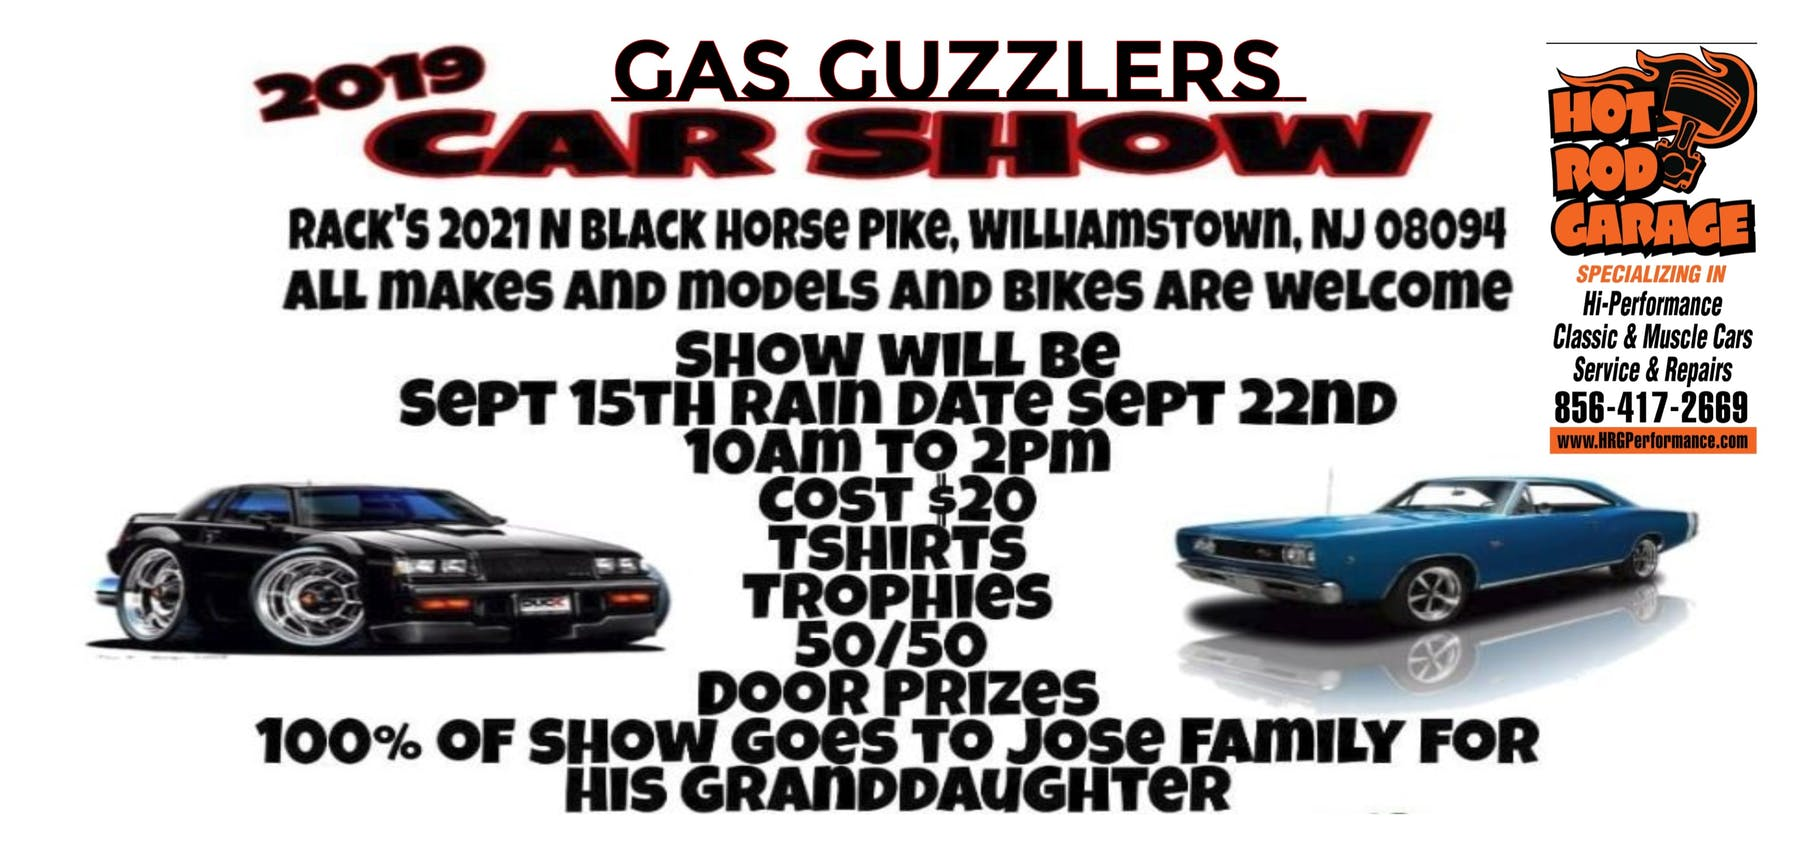 Car Shows | Racks Pub & Grill